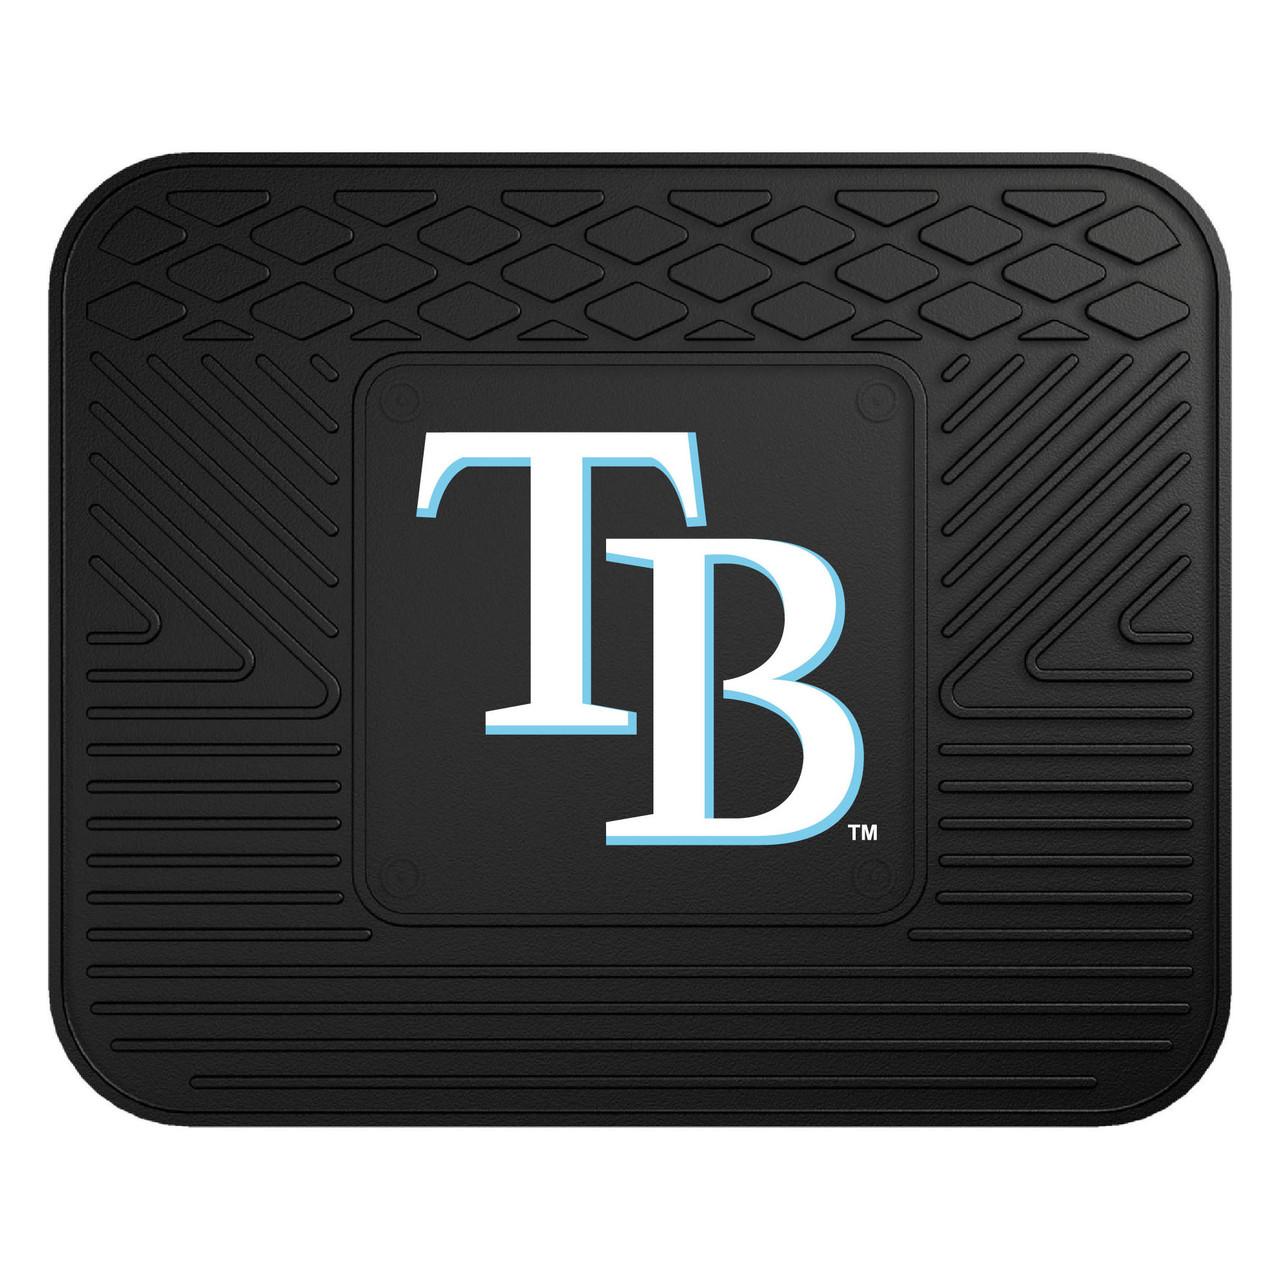 MLB TAMPA BAY RAYS 4 PIECES HEAVY DUTY RUBBER FLOOR MATS SET CAR VAN TRUCK